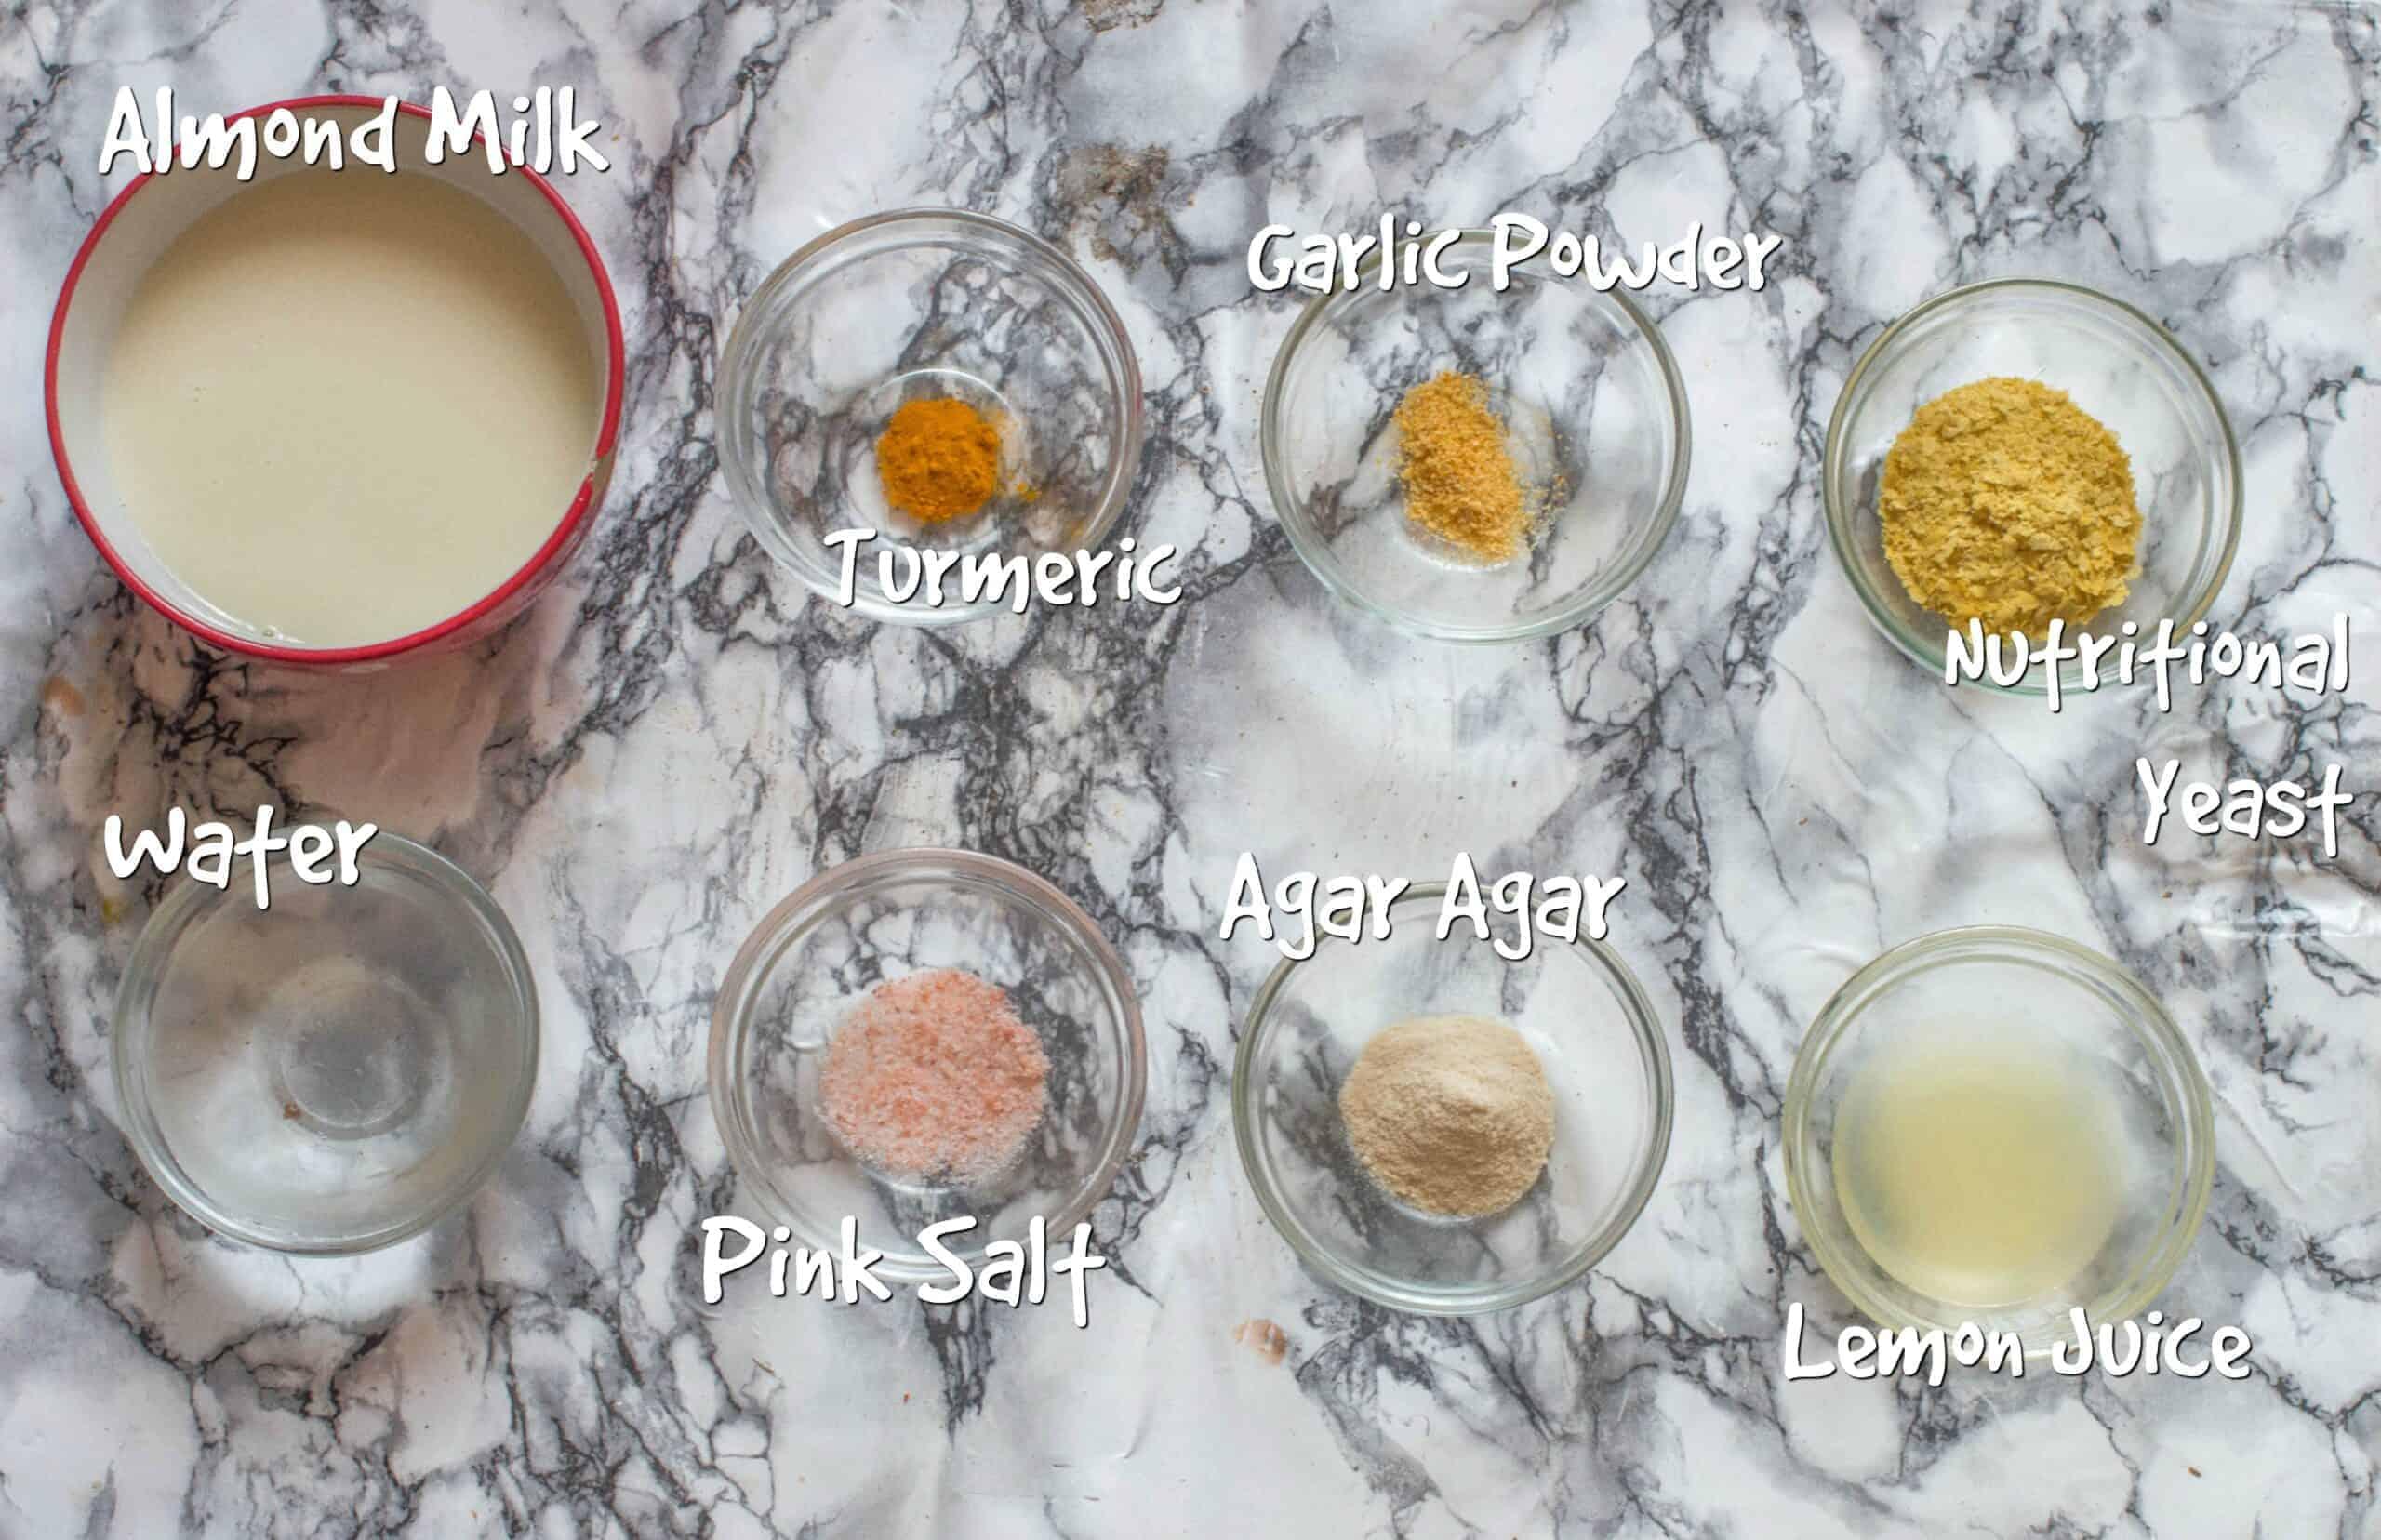 ingredients to make homemade vegan cheddar cheese